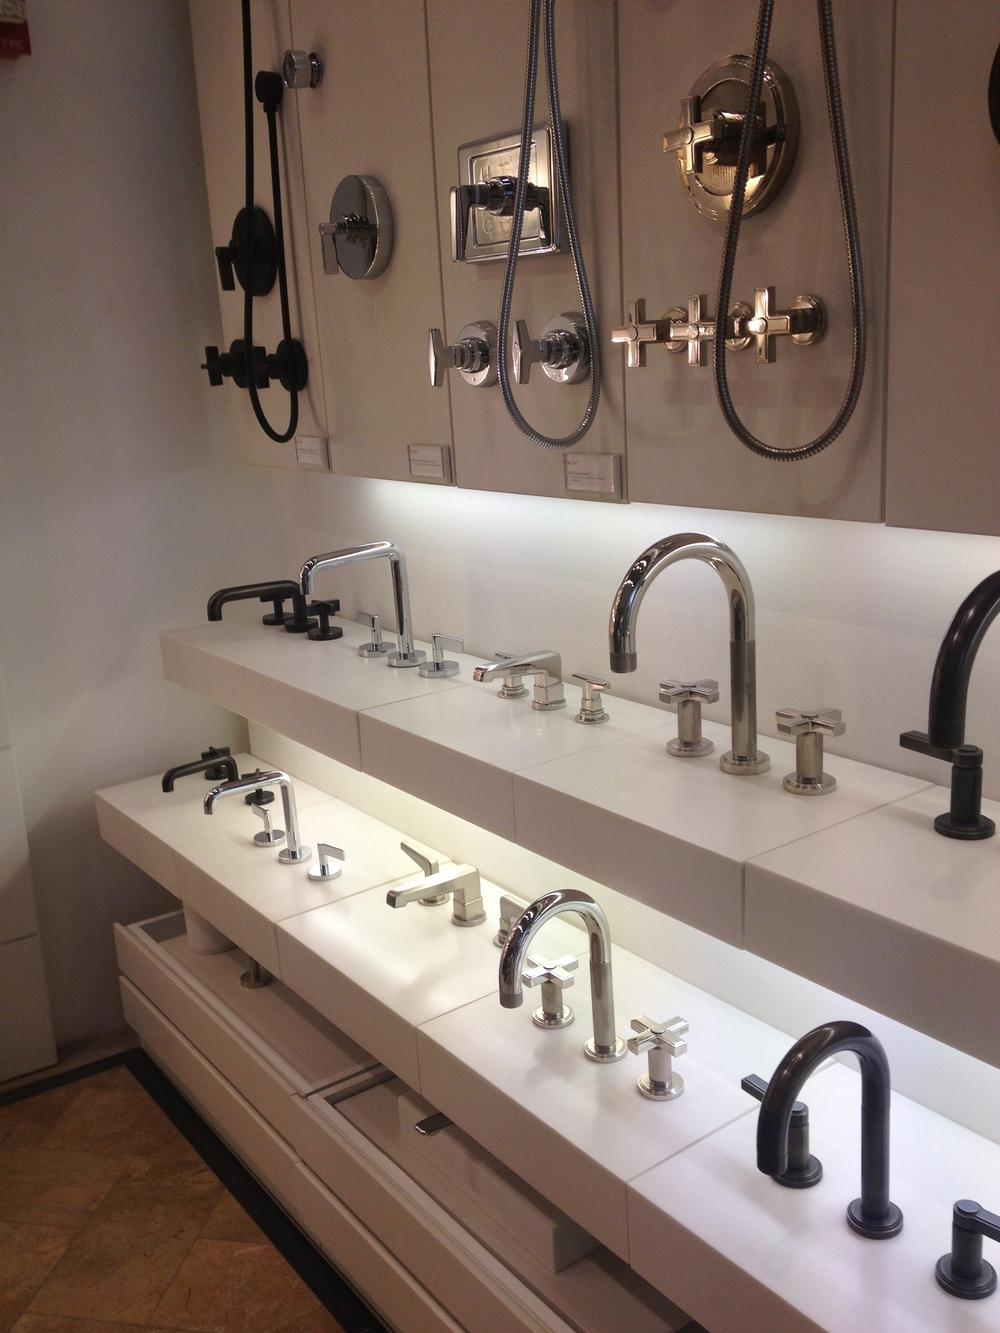 Kalista's showroom in Chicago. www.saranobledesigns.com